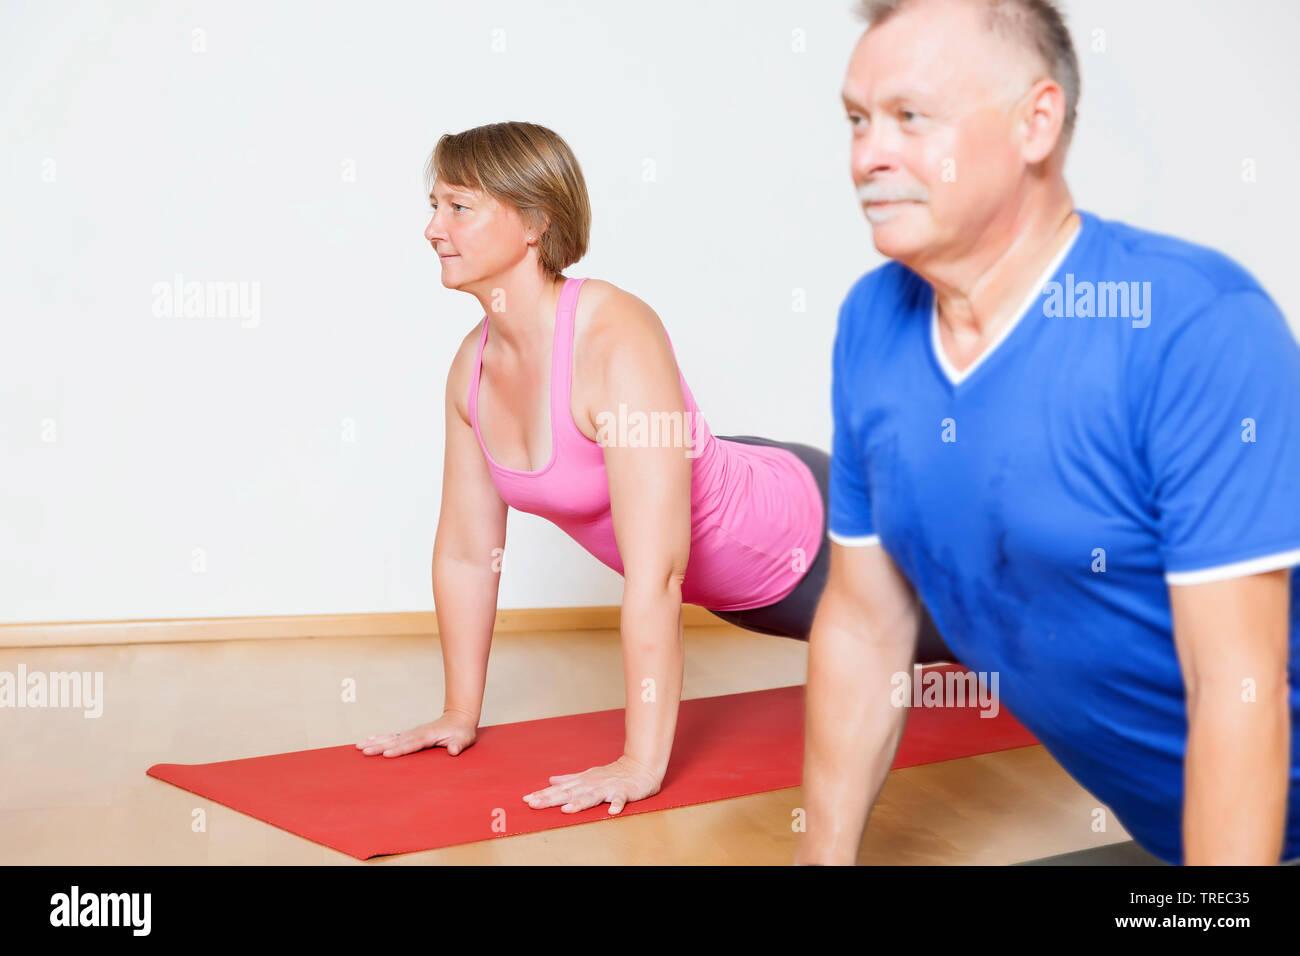 Frau und Mann machen Yoga-Uebungen, Europa | woman and man doing yoga, Europe | BLWS522583.jpg [ (c) blickwinkel/McPHOTO/M. Gann Tel. +49 (0)2302-2793 - Stock Image